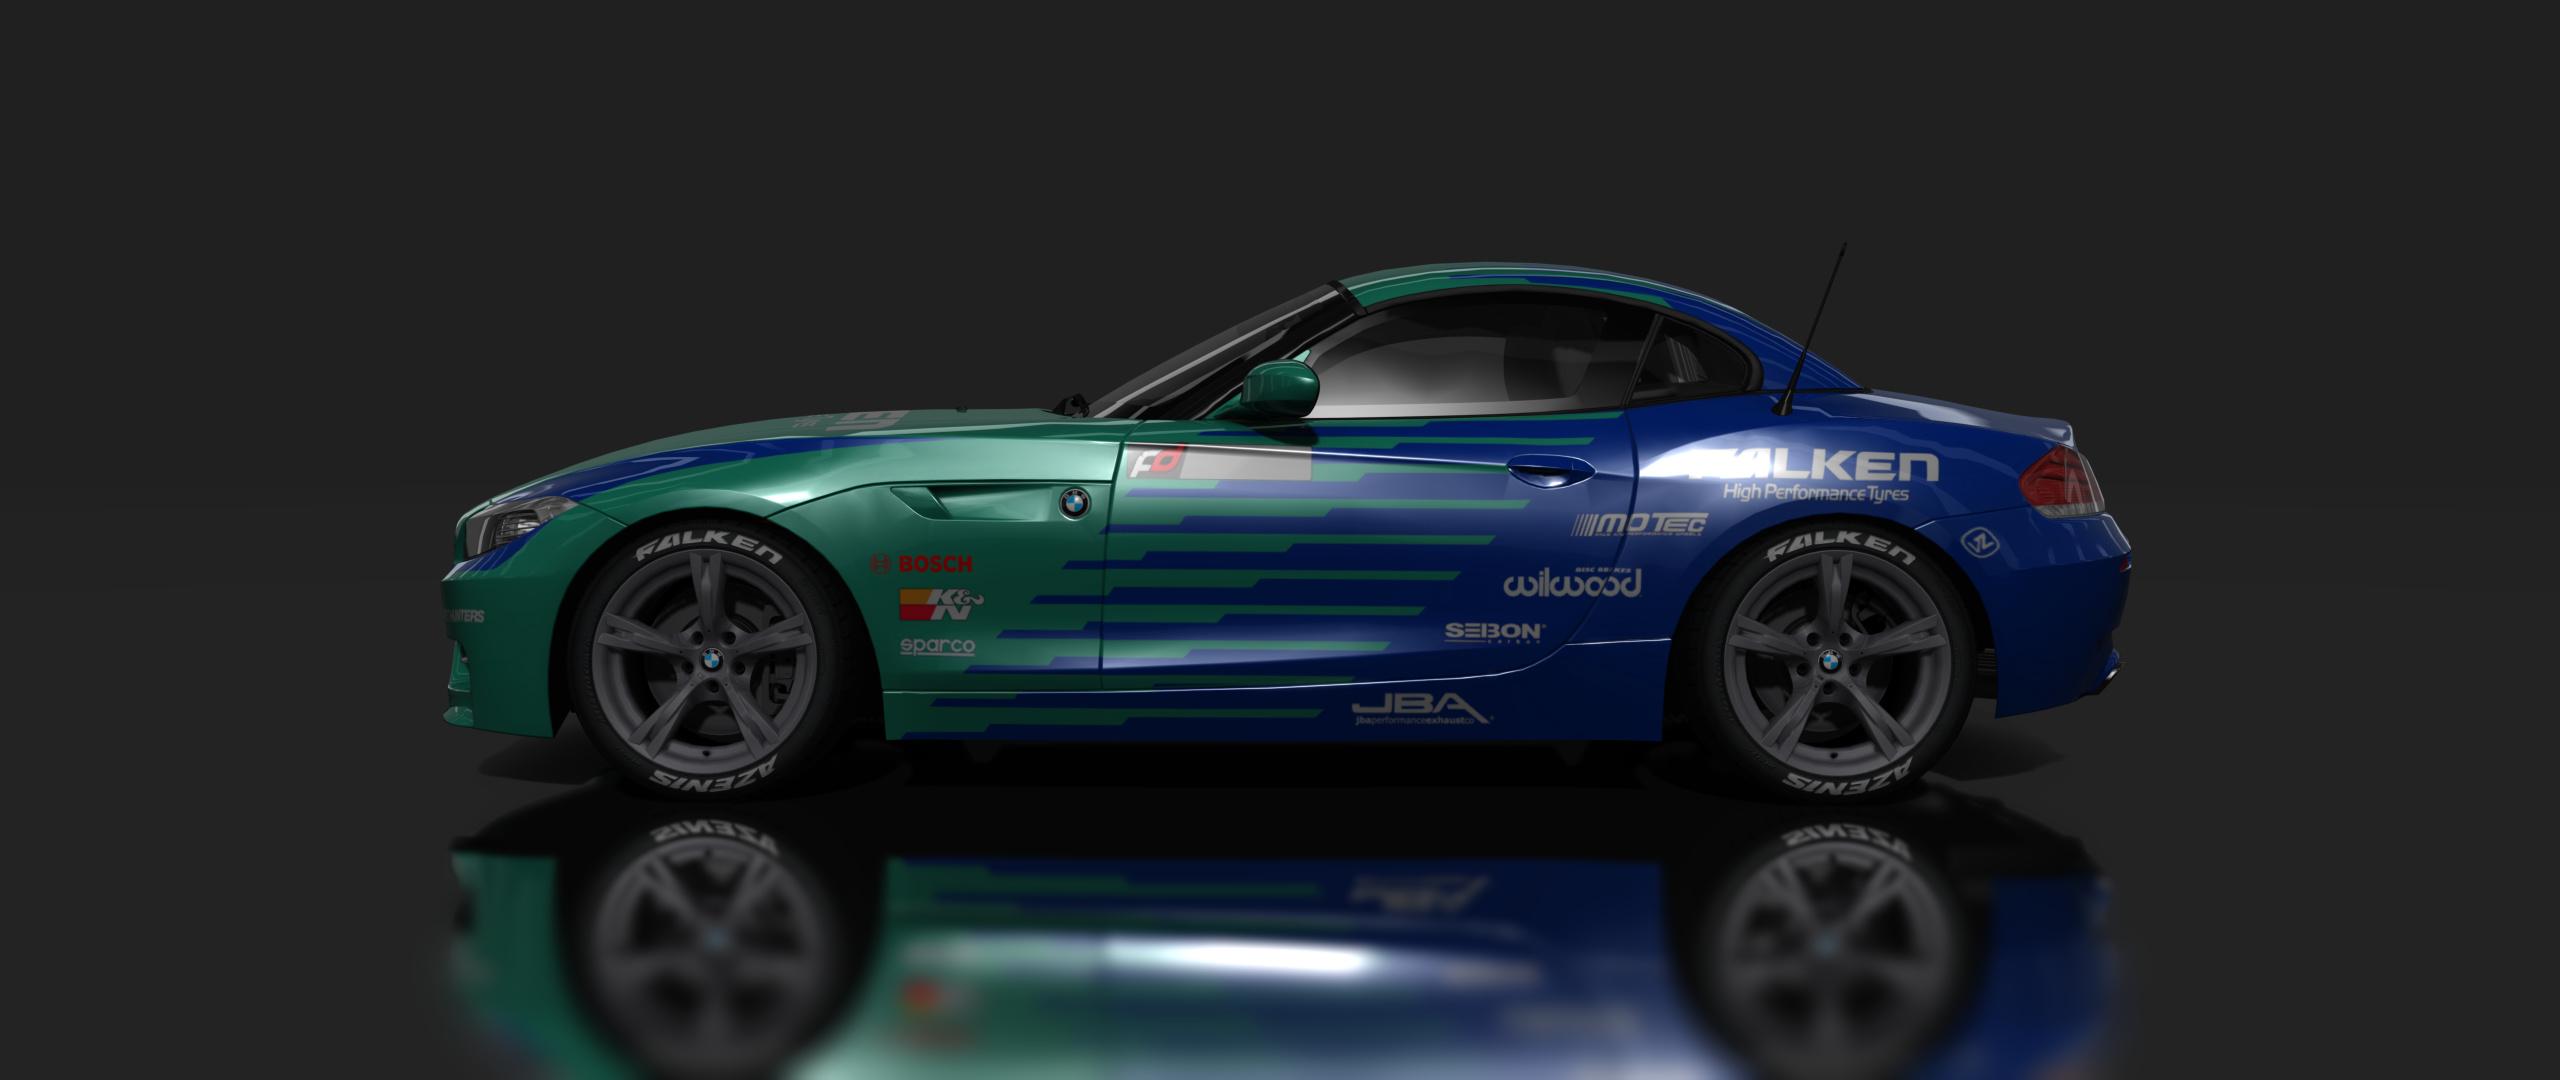 Bmw Z4 Visual Update Racedepartment